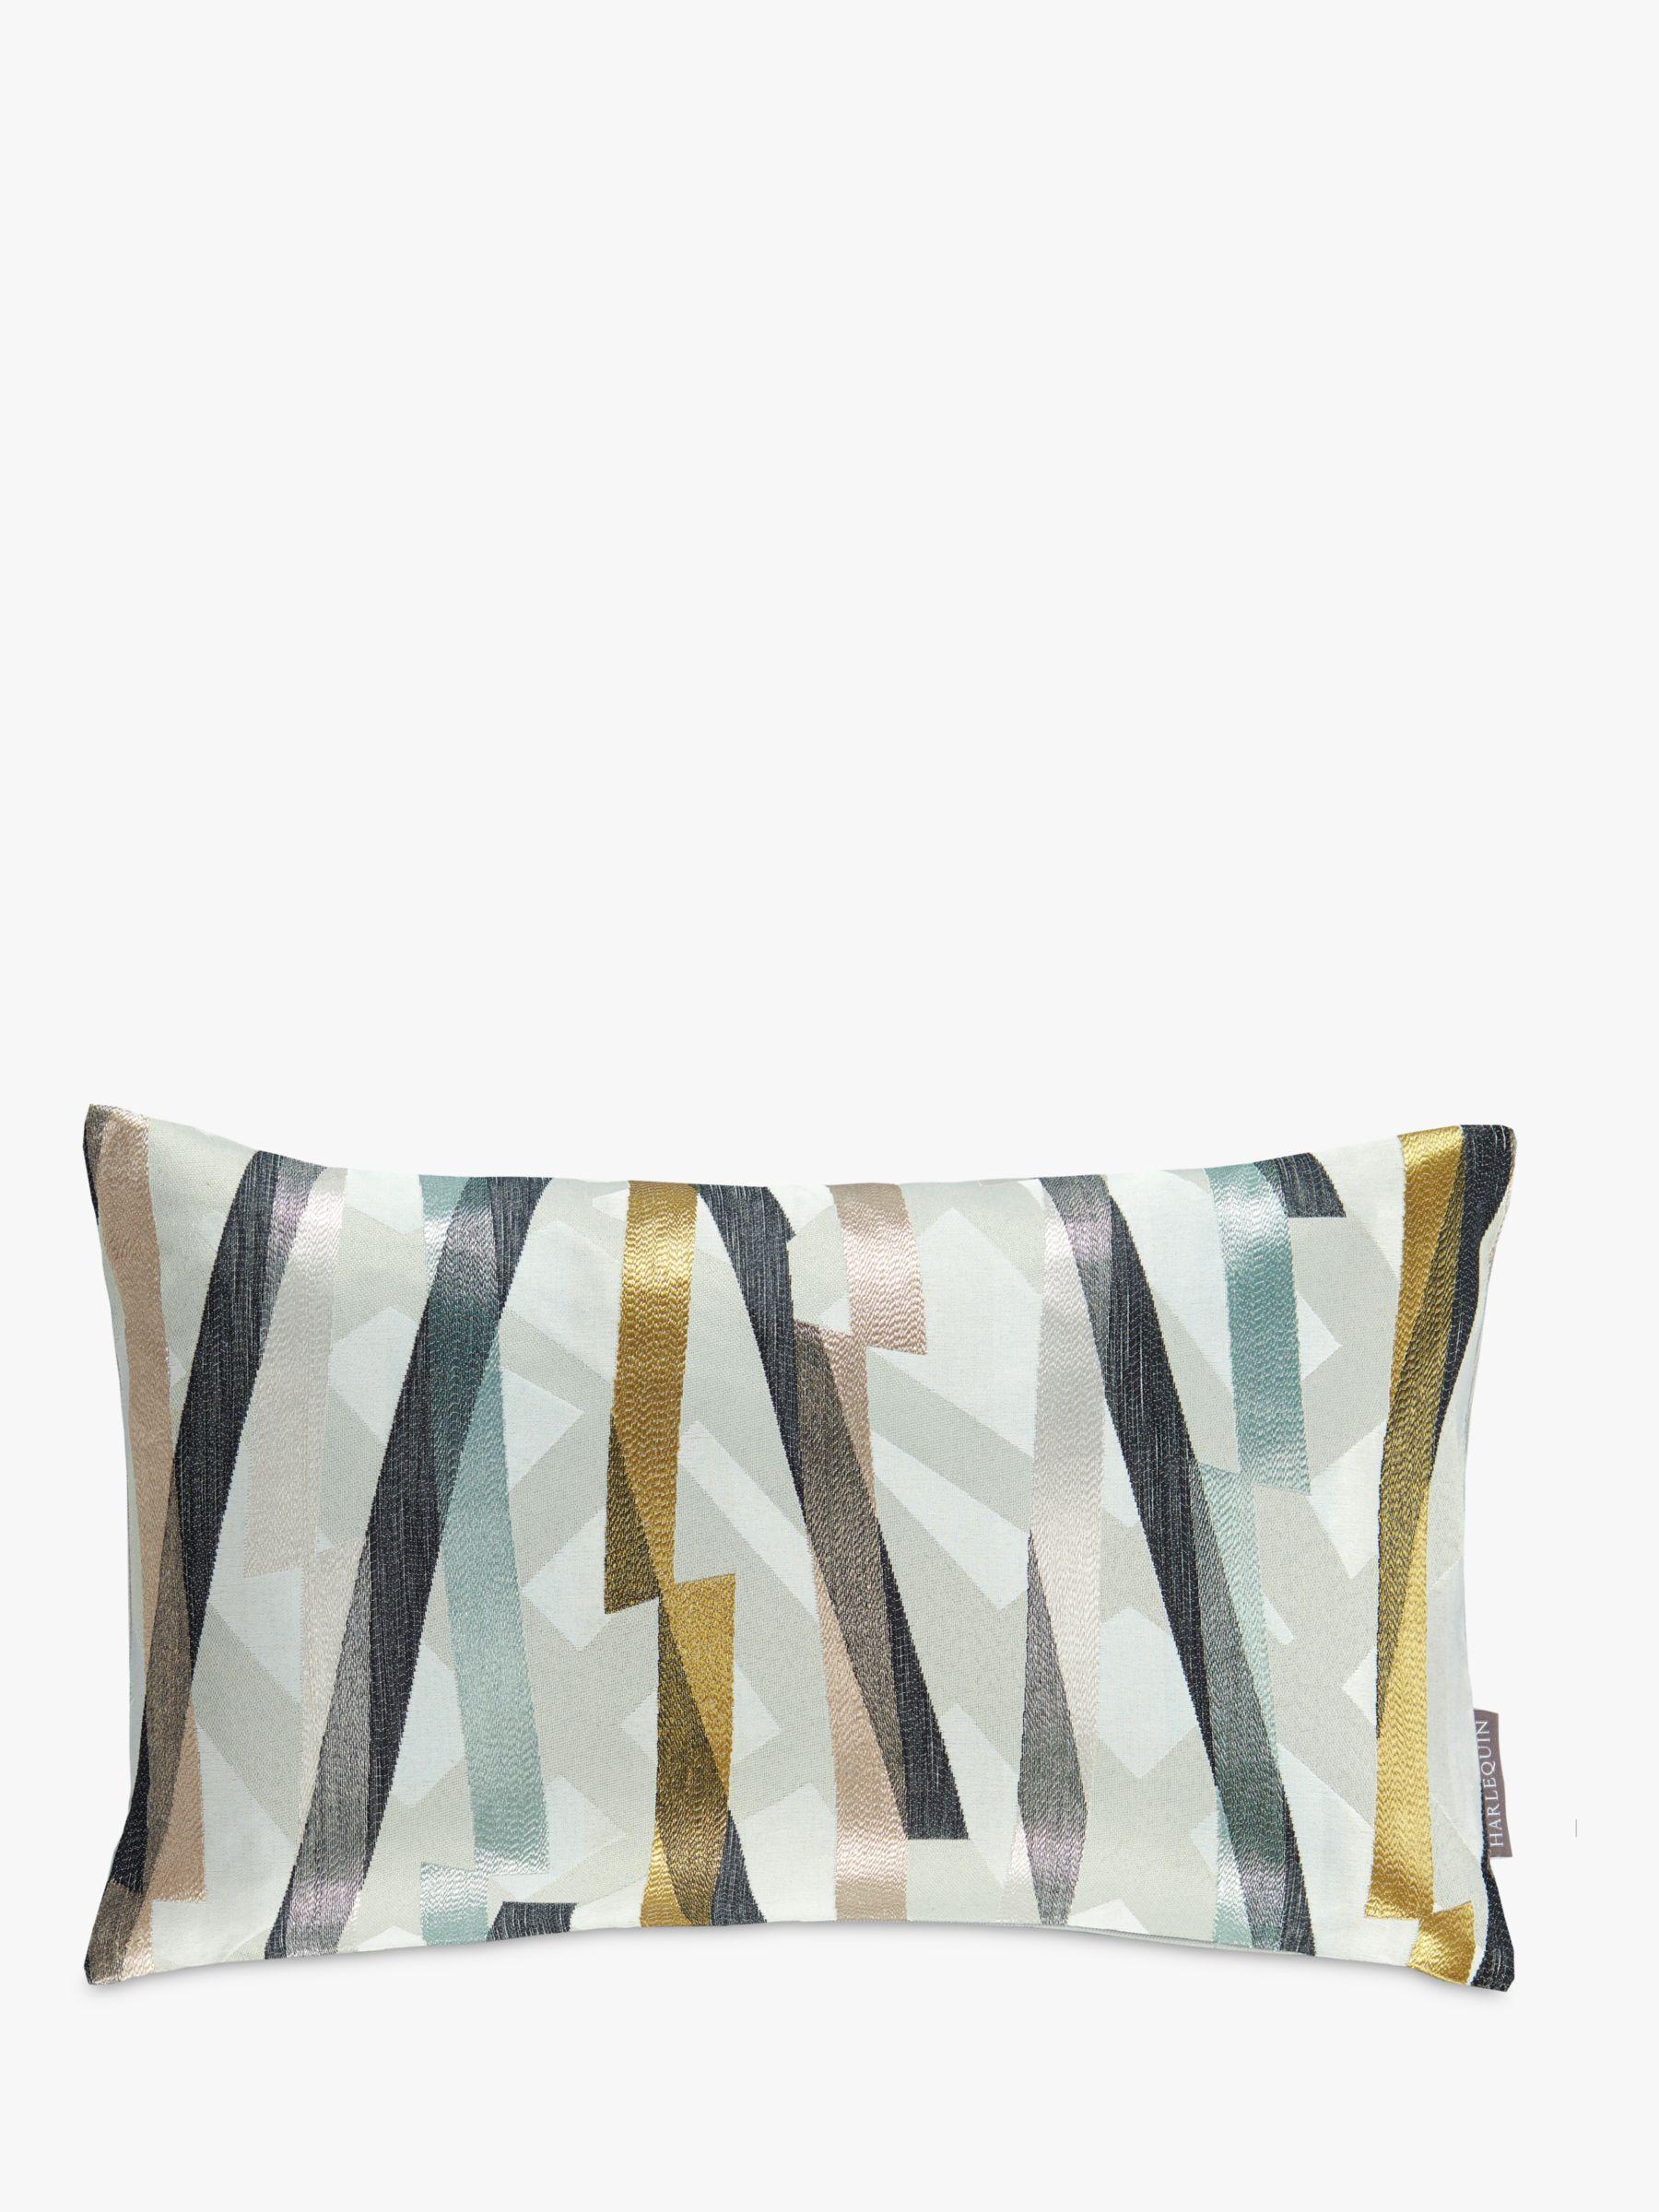 Harlequin Harlequin Diffinity Cushion, Topaz